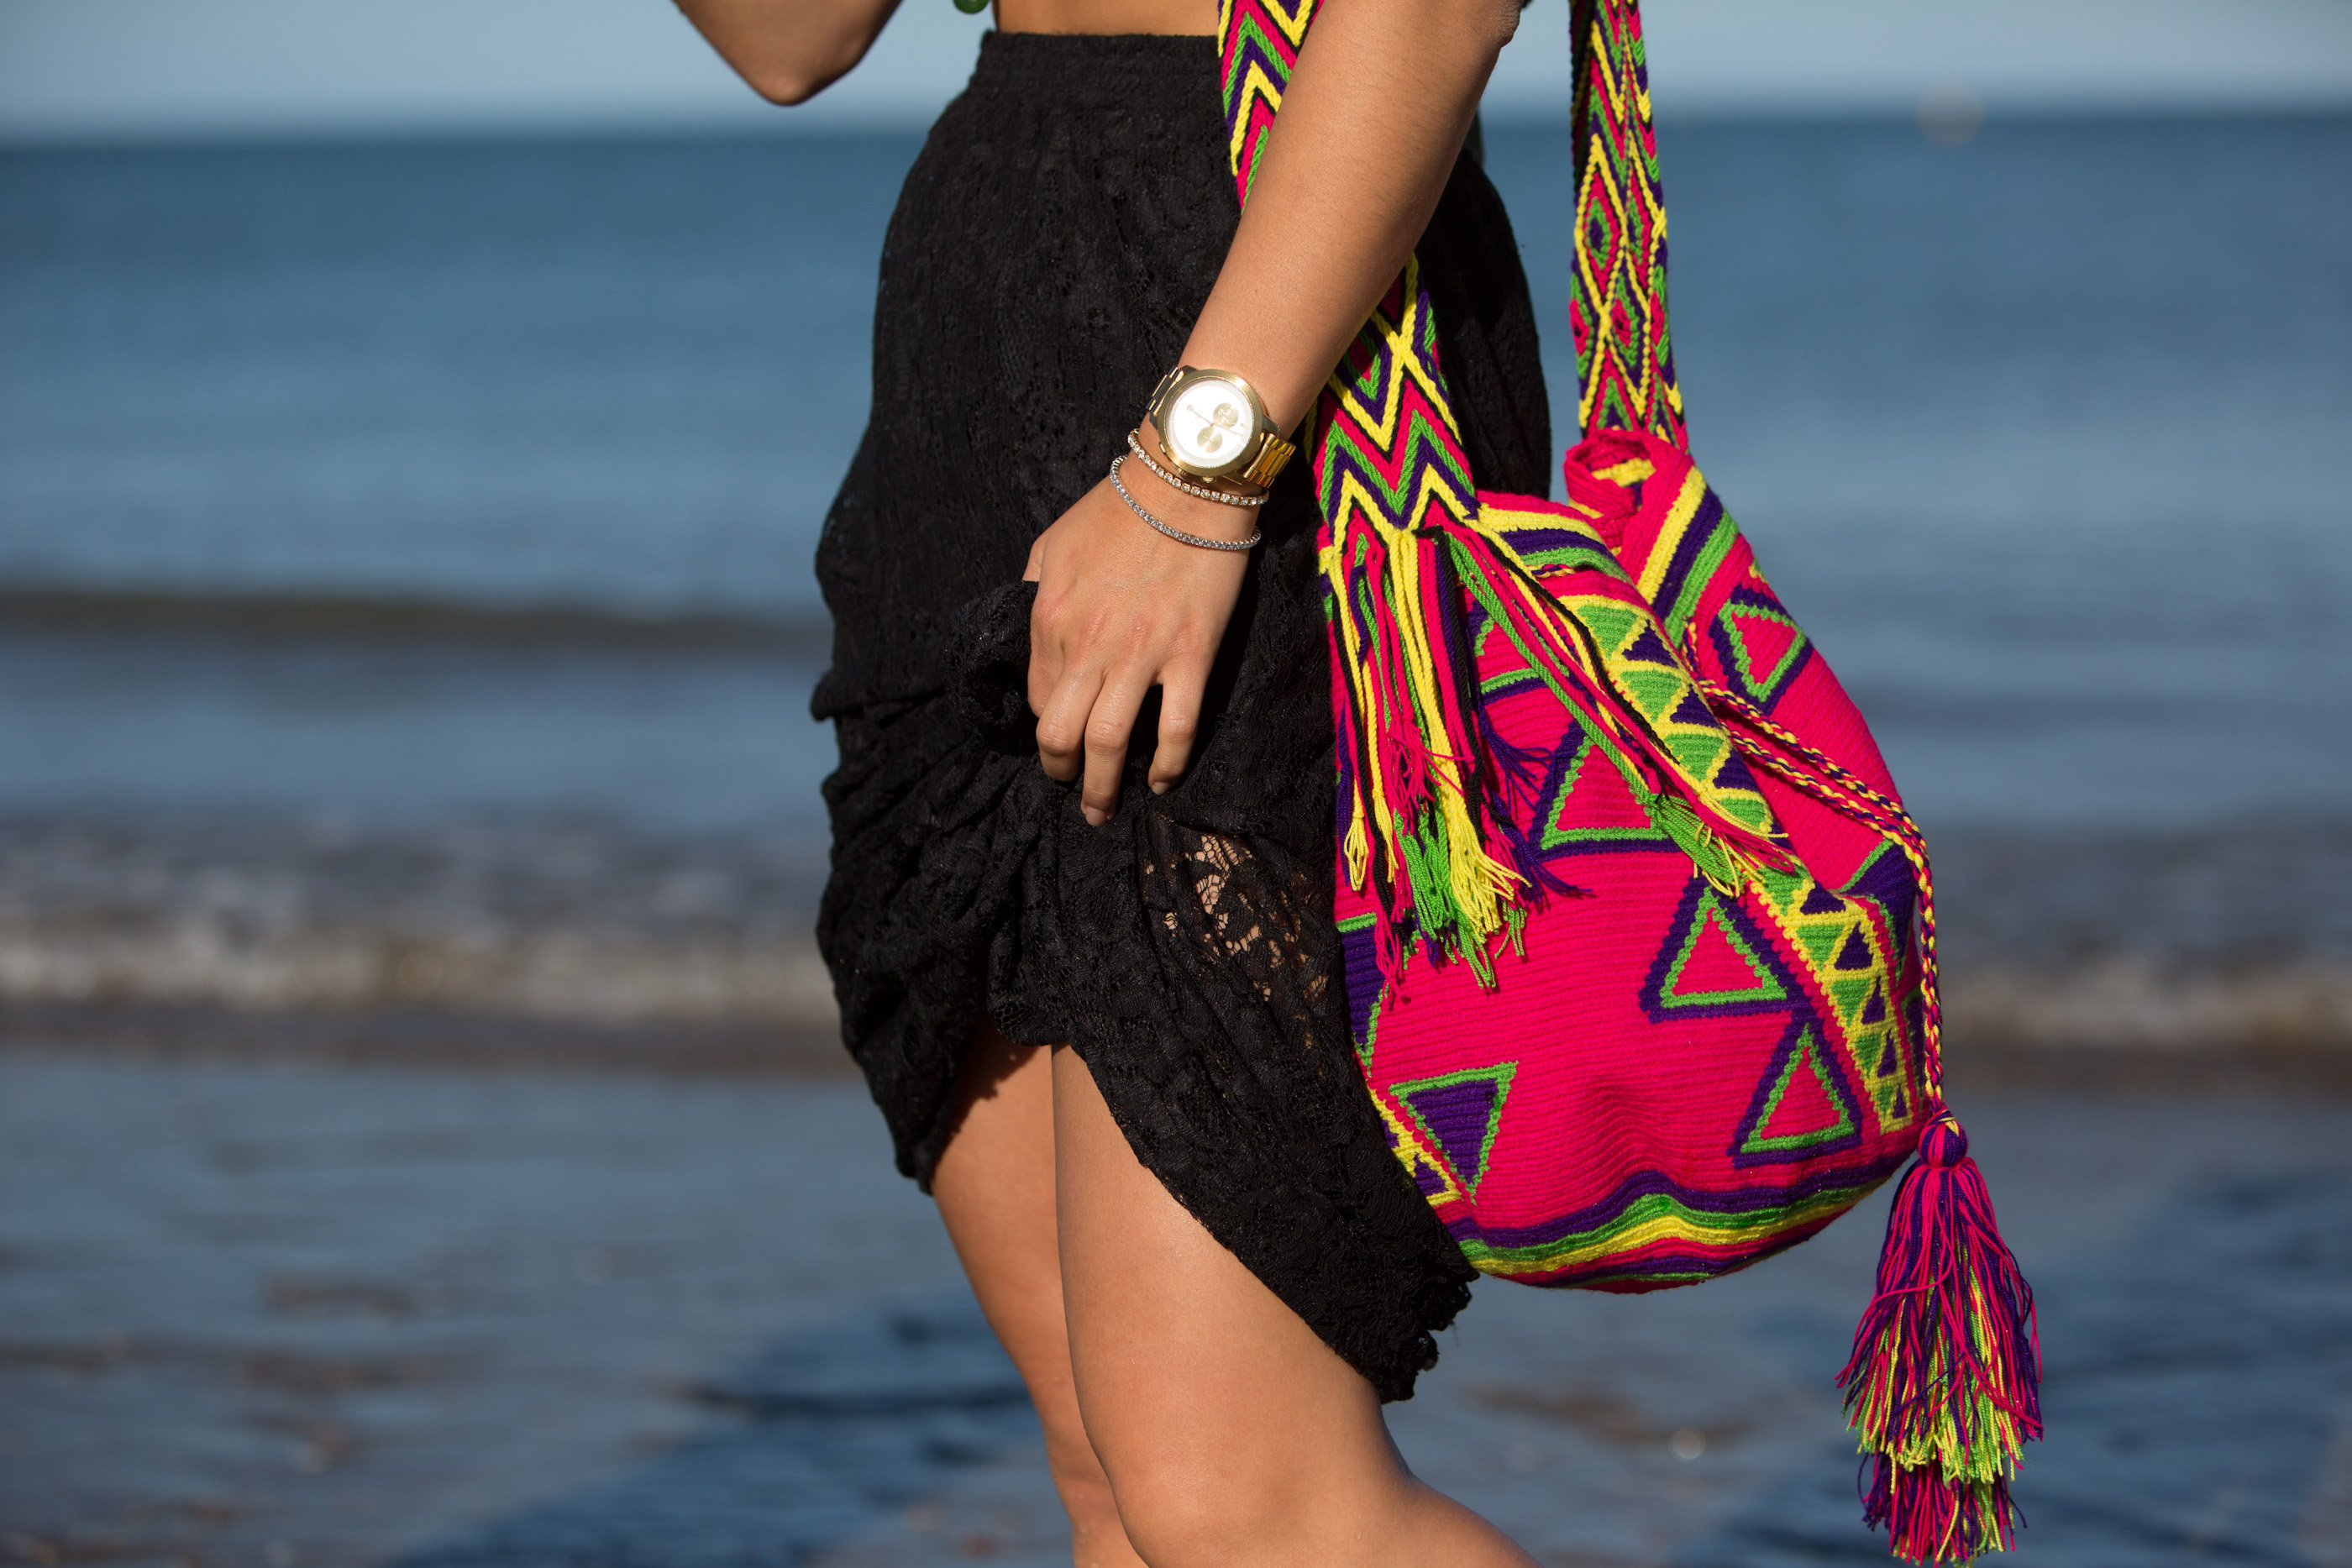 Wayuu Bag Mochila Bag Wayuu Bags Bags Mochila Ybgm76Ifyv